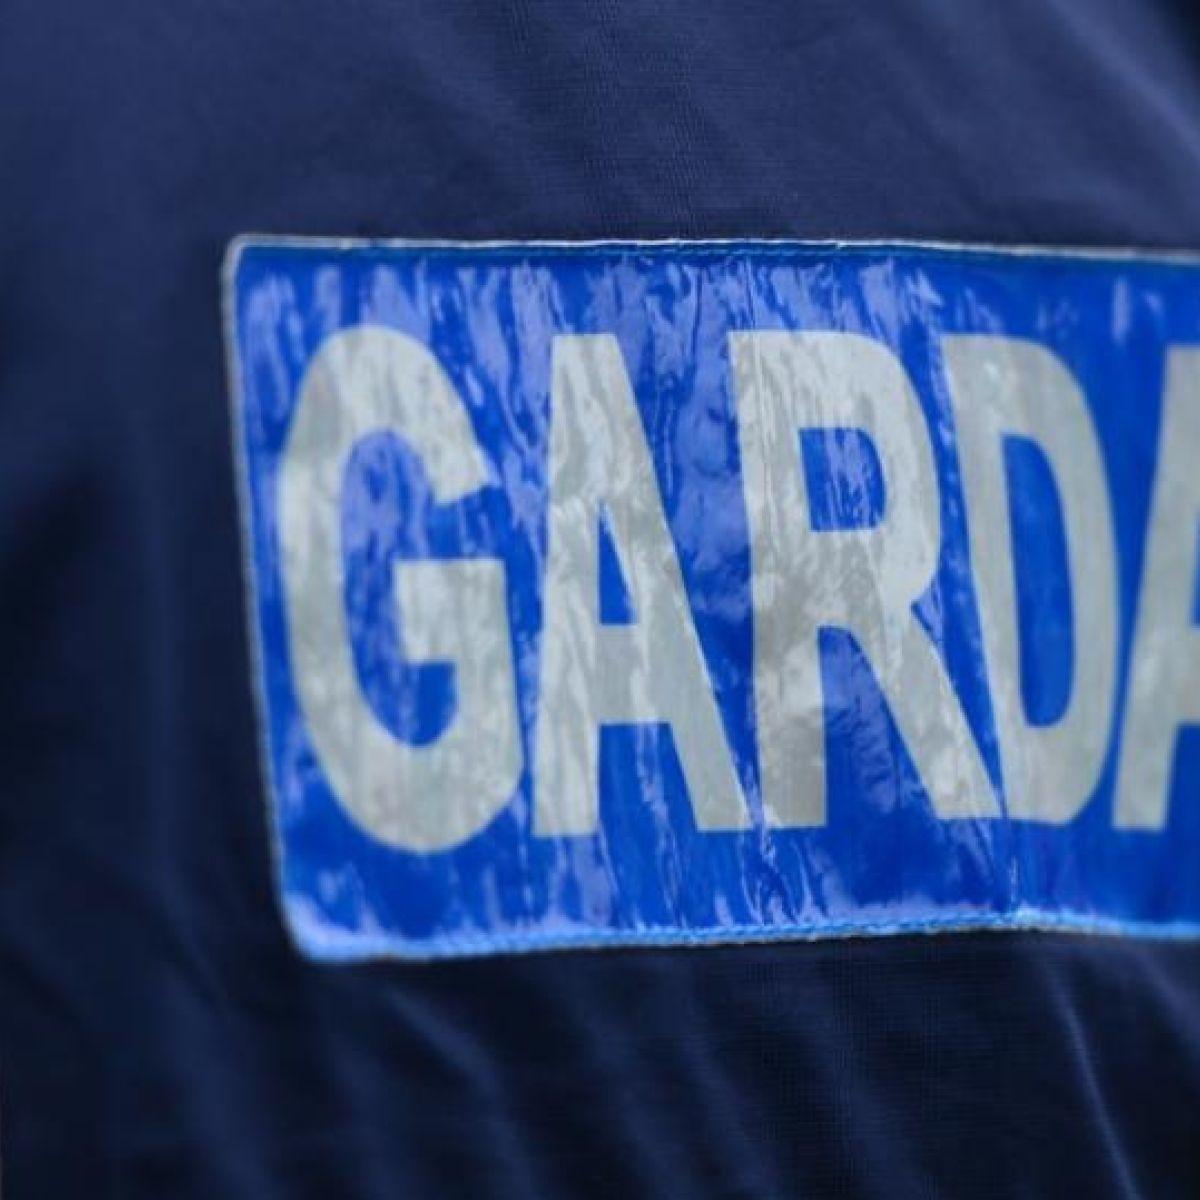 irishtimes.com - Conor Gallagher - Gardaí seize €100,000 worth of cannabis in Offaly